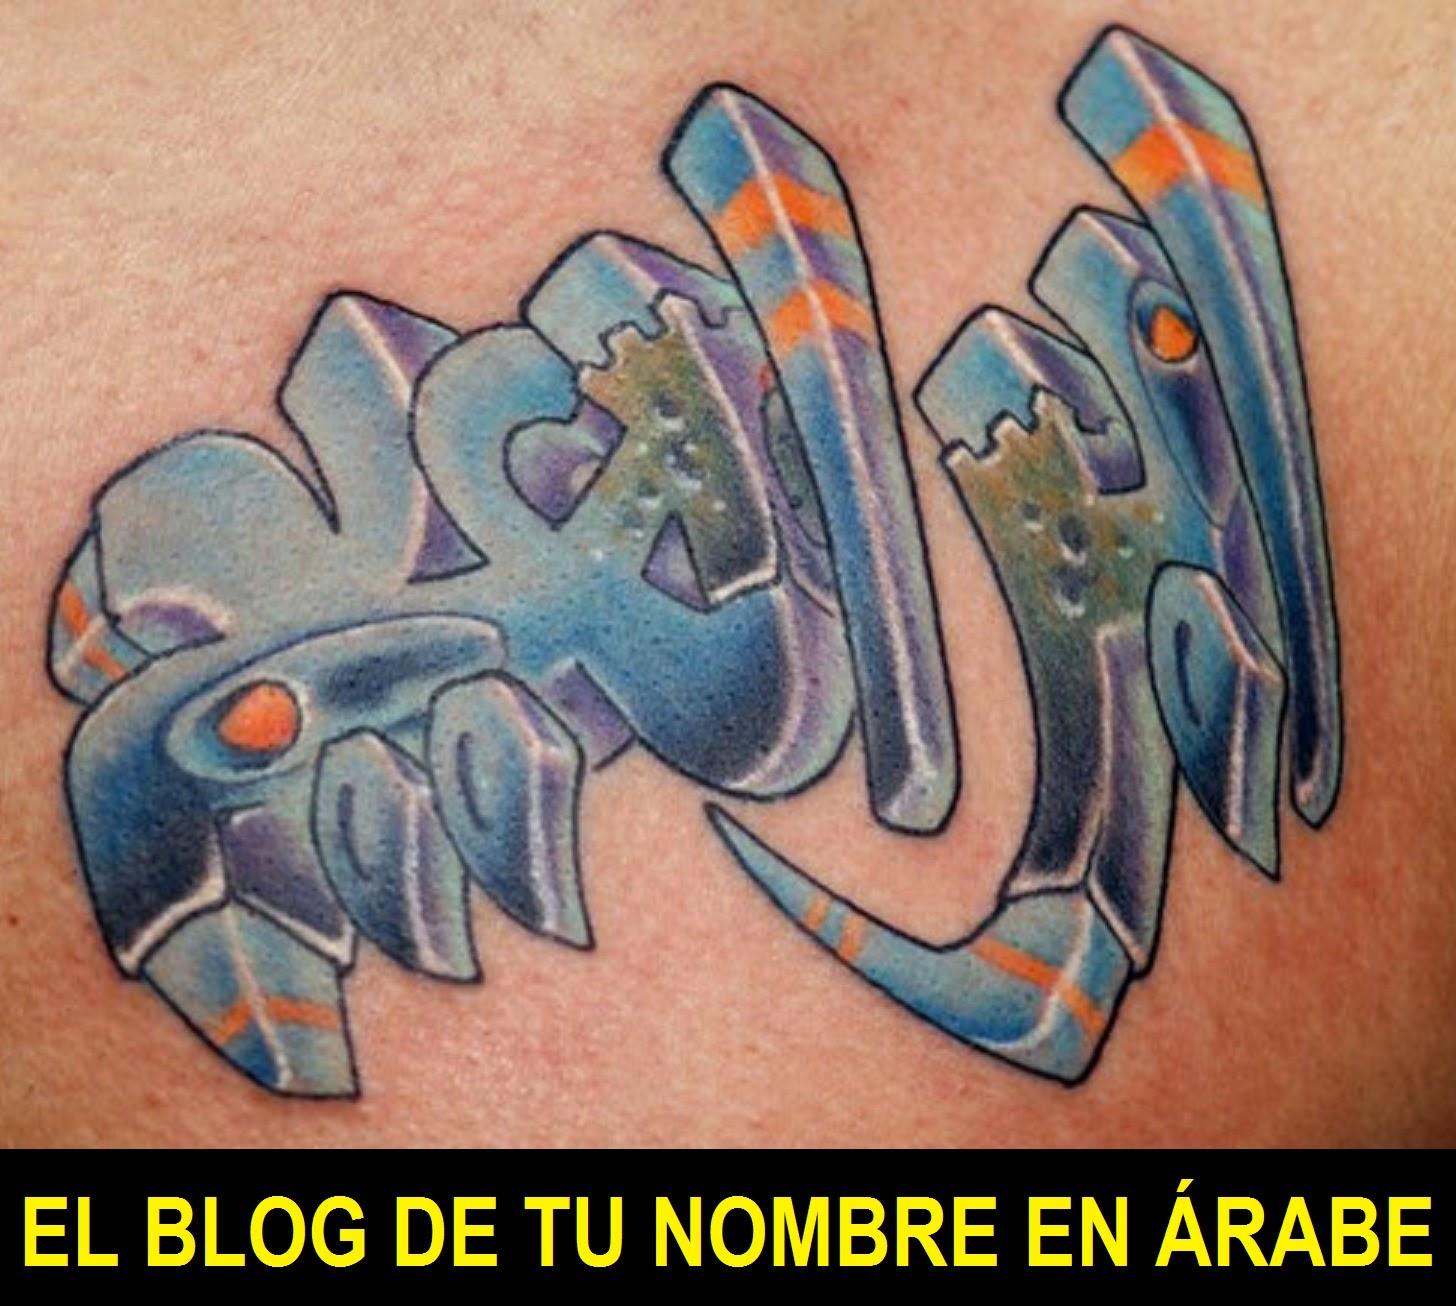 ... de letras en arabe tatuaje en la espalda tatuajes en forma de grafiti